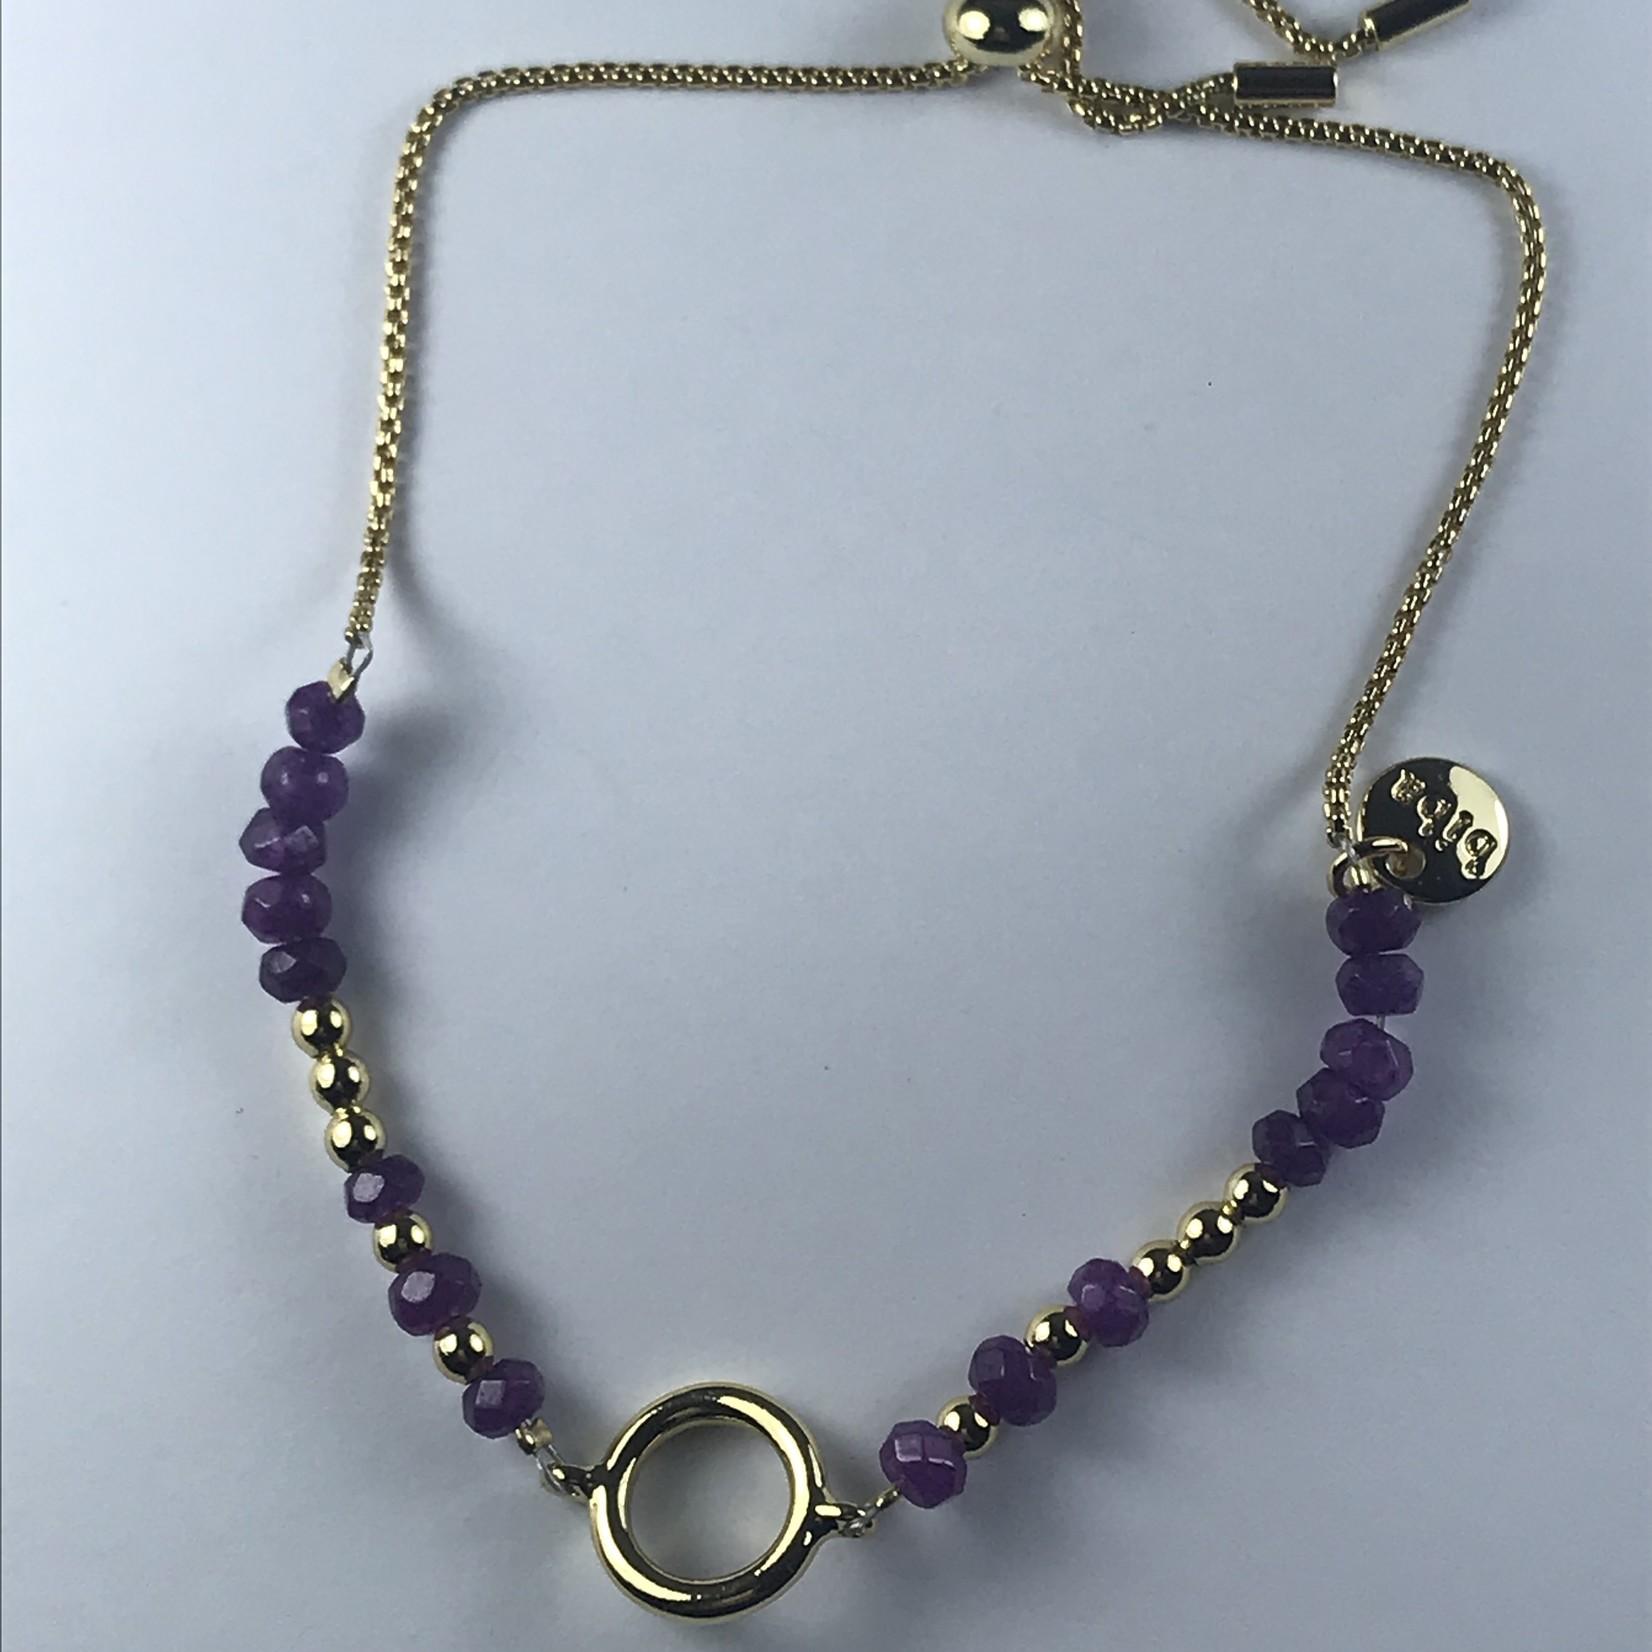 Biba fijne armband - goudkleurig  met paarse kraaltjes